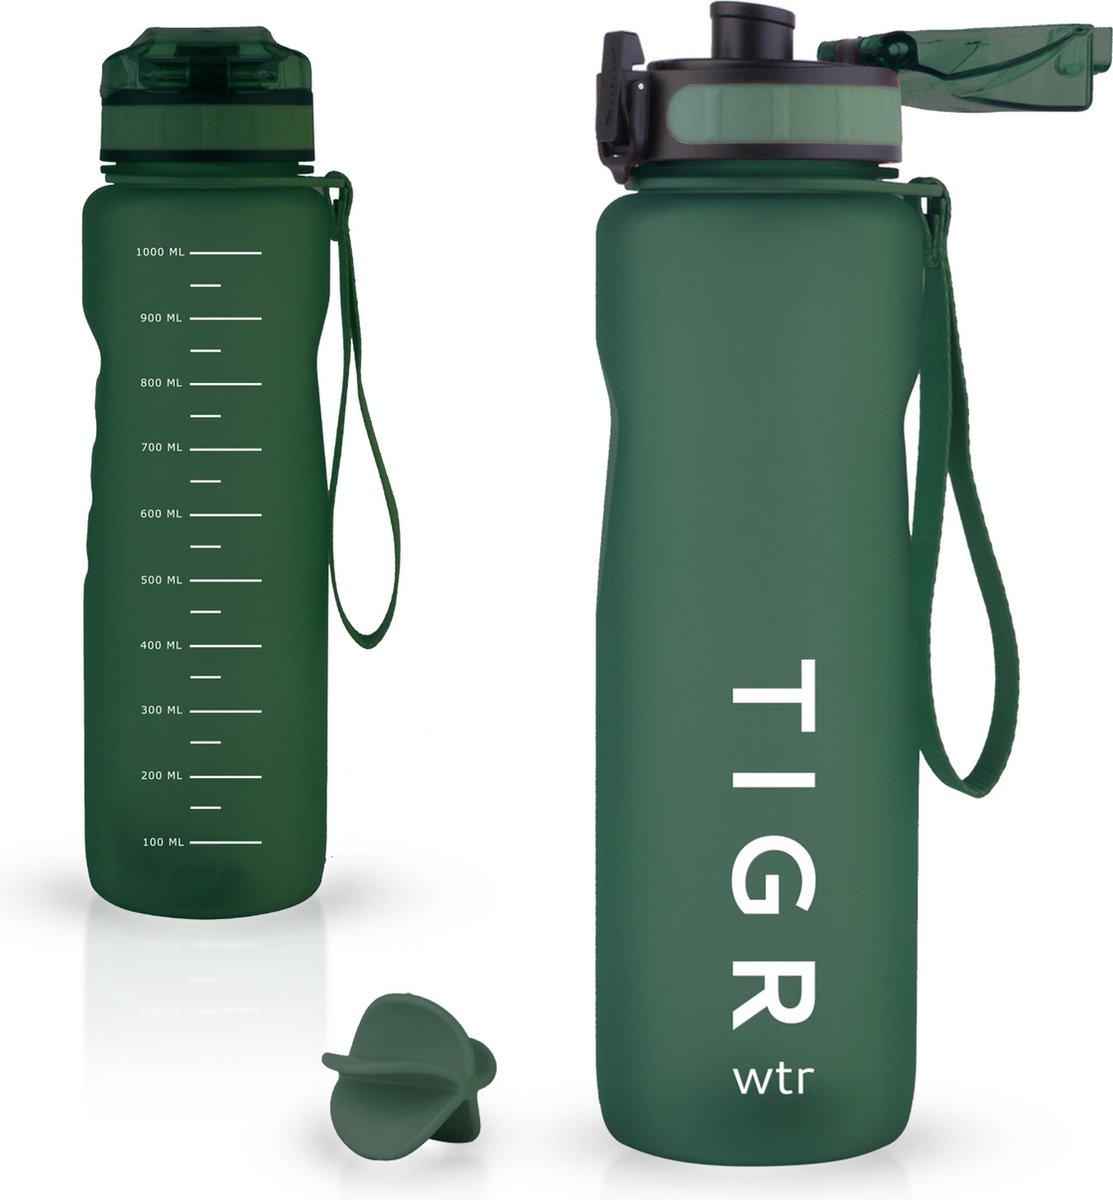 TIGR The Athlete - Drinkfles met fruitfilter - 1000ML - Sportfles - Groen - Gratis mengbal voor eiwi